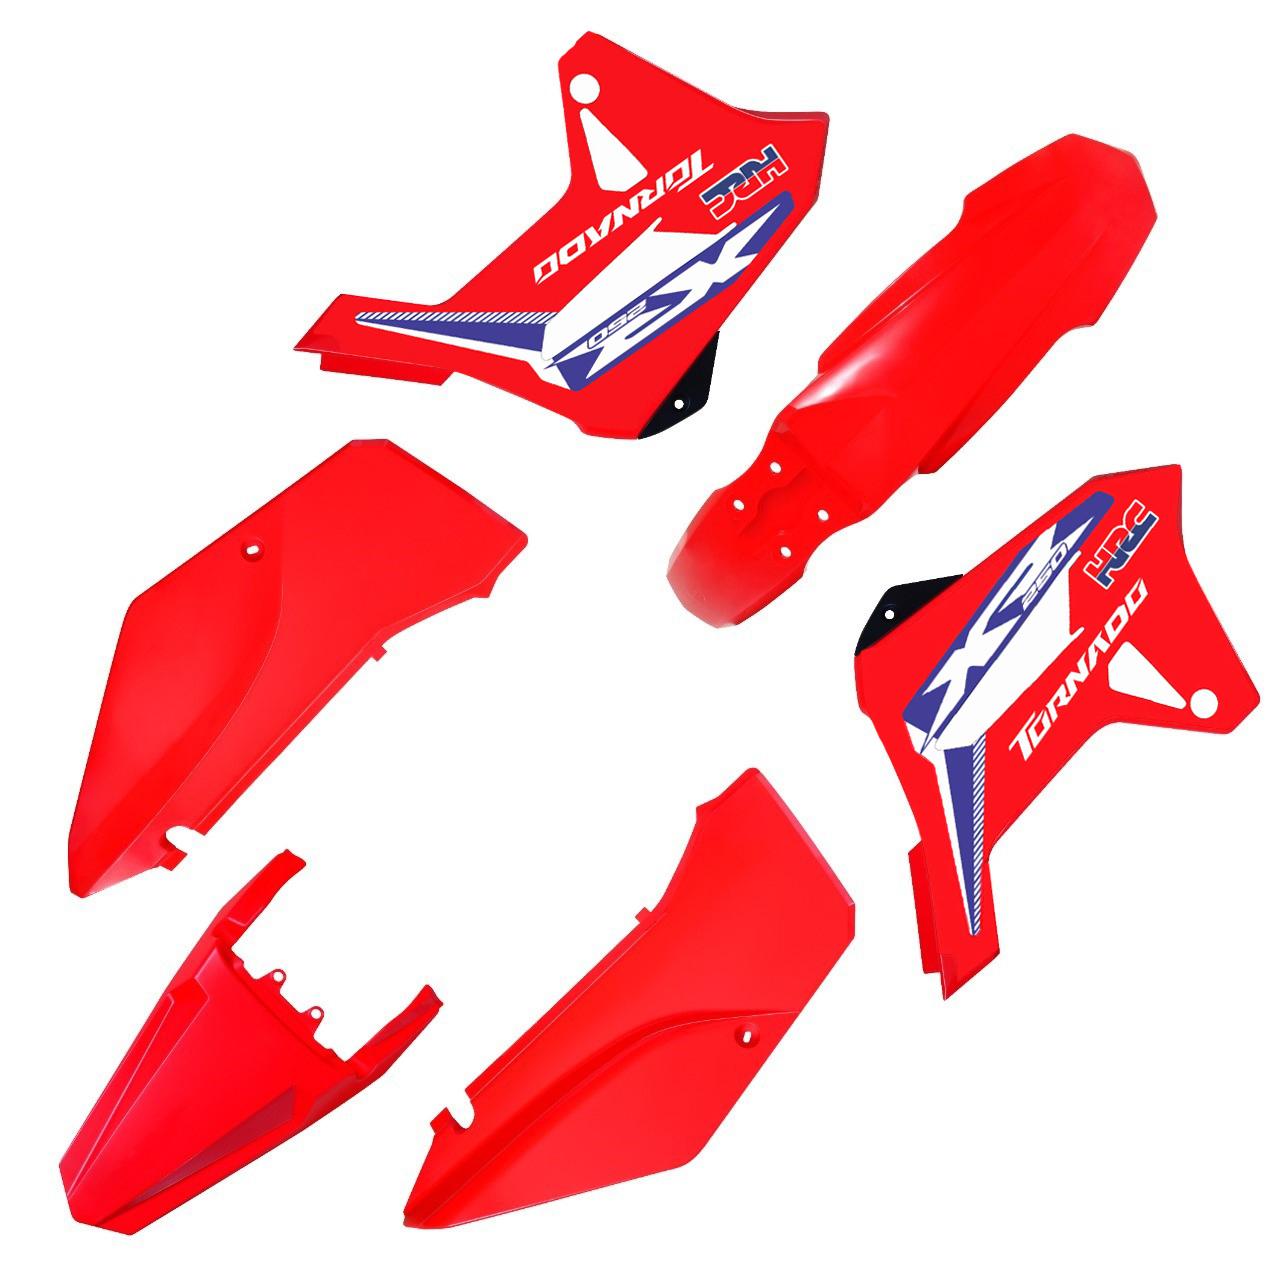 Kit Plástico Carenagem Biker R1de C/ Adesivos Xr 250 Tornado